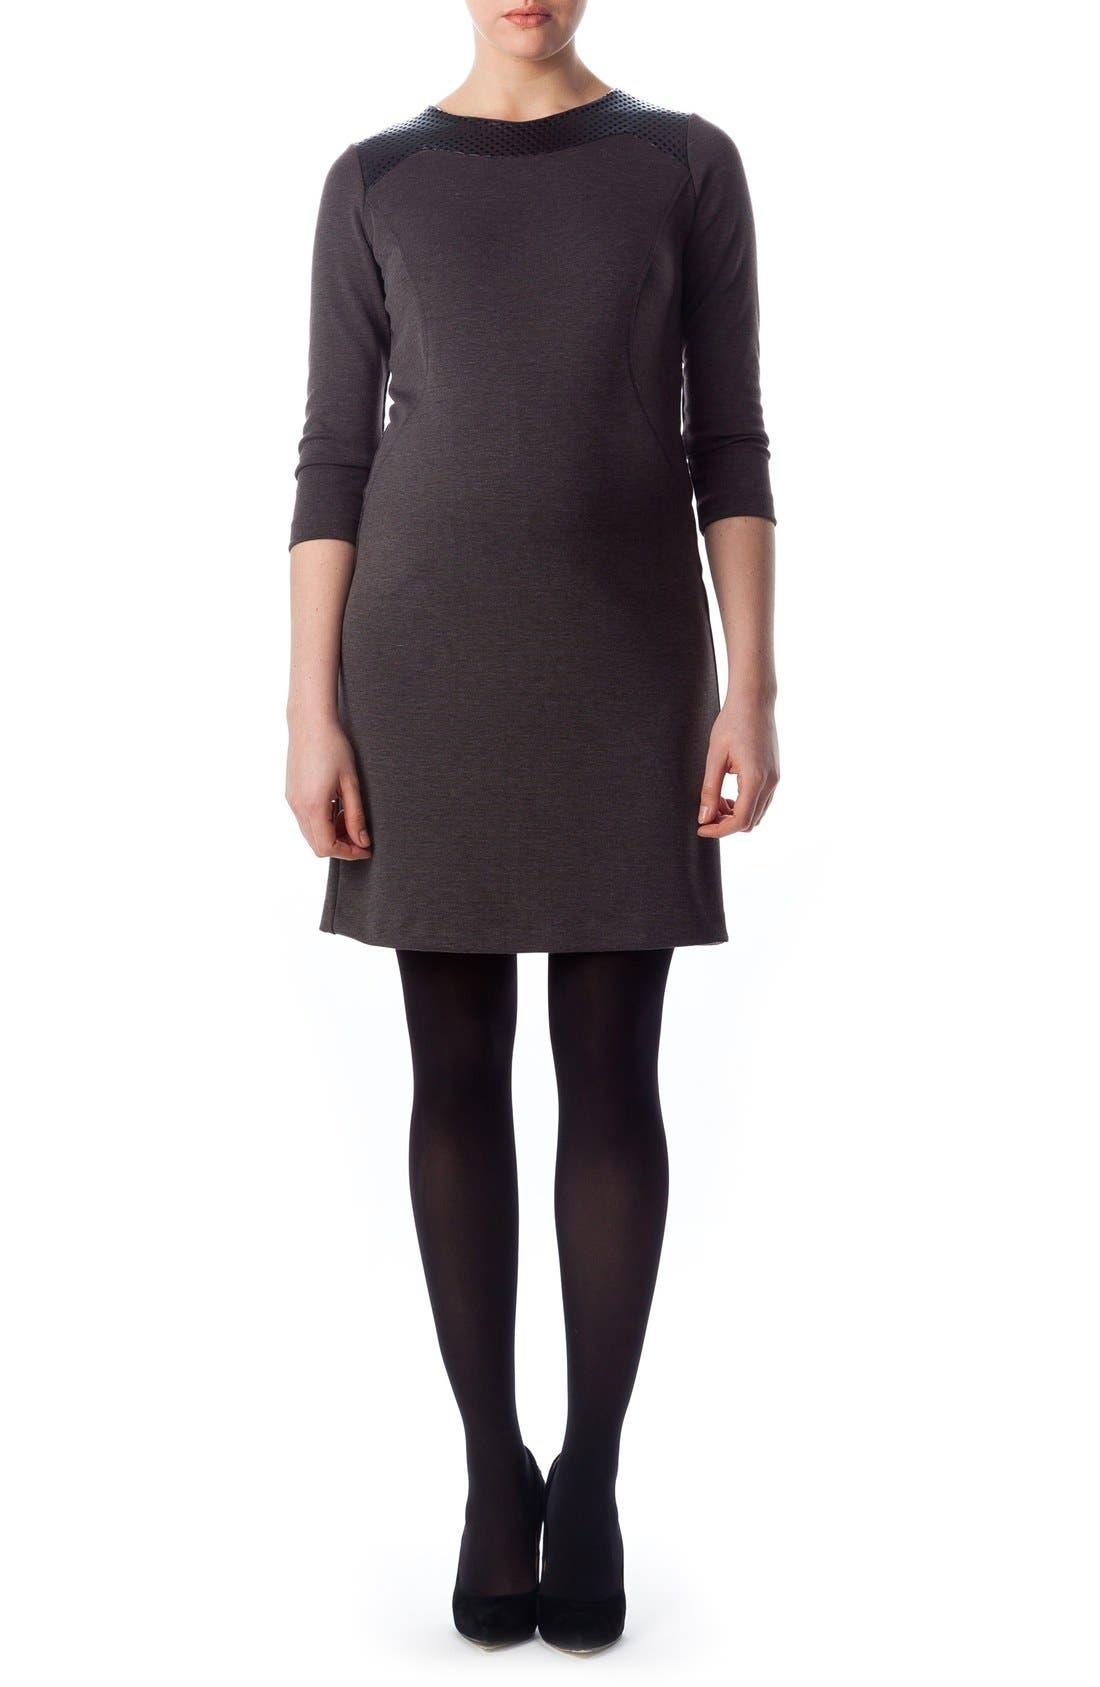 Milano Ponte Dress,                         Main,                         color, Dark Grey Melange/ Black